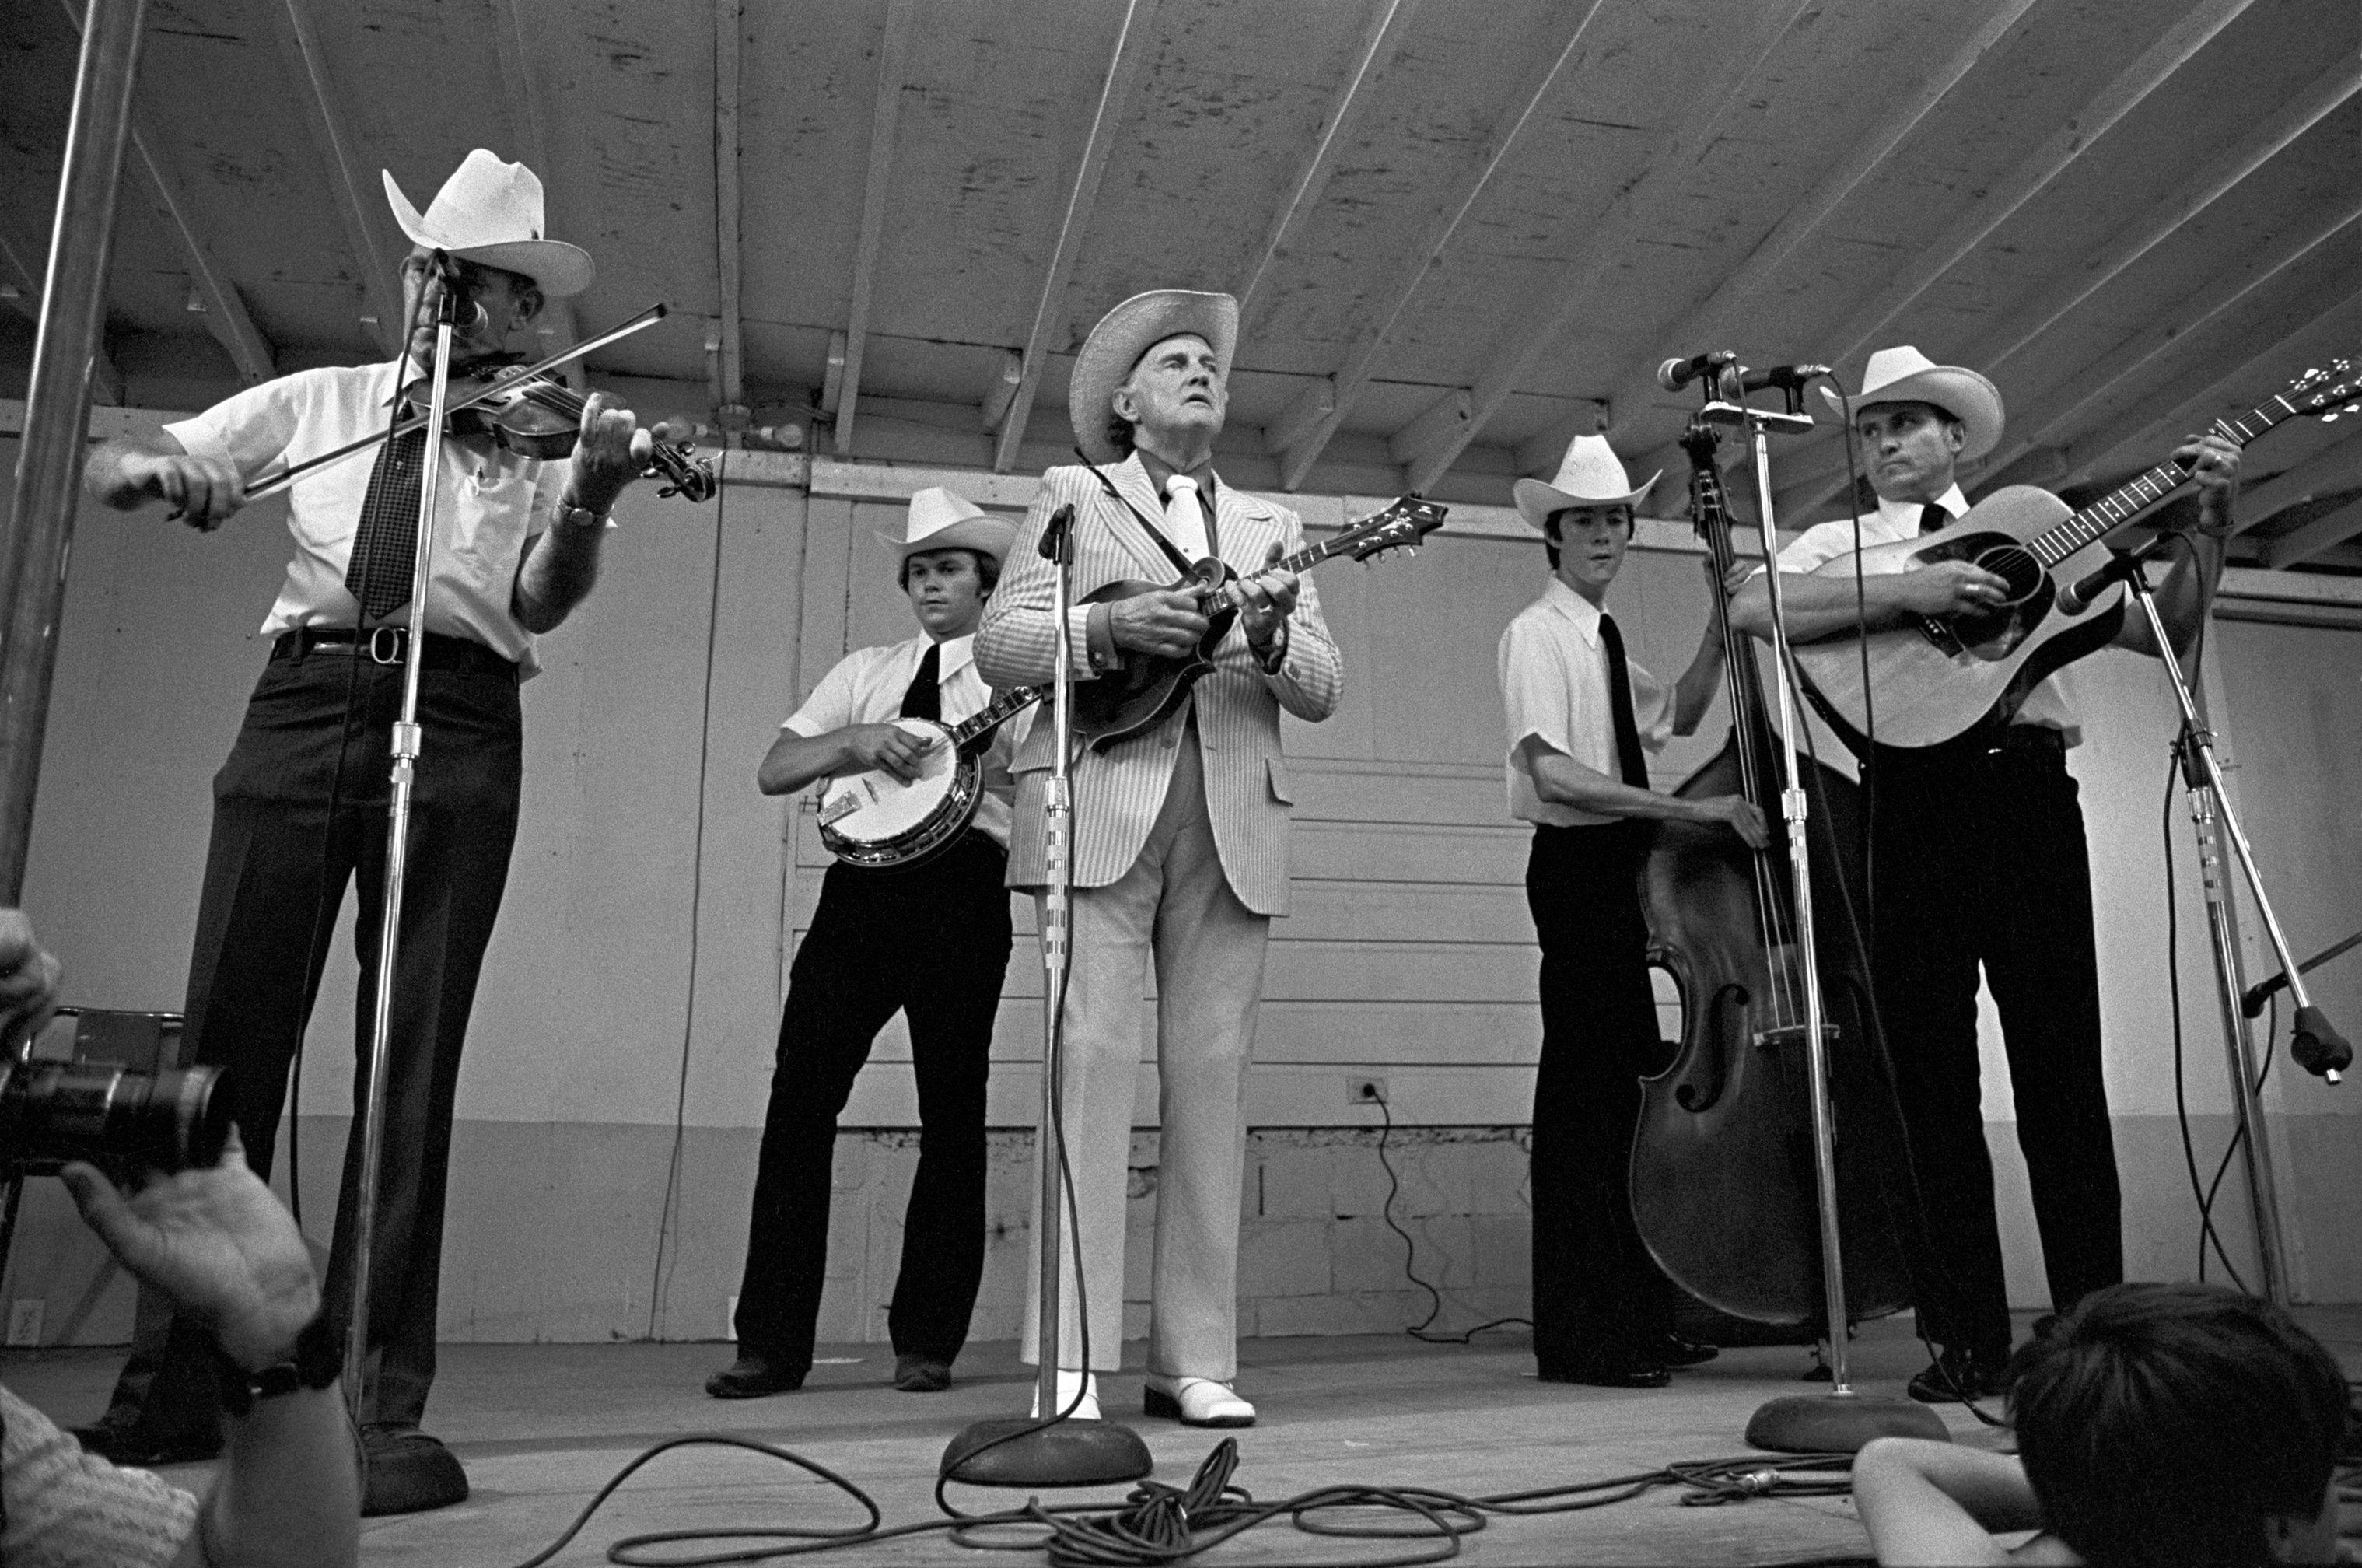 Bill Monroe and the Blue Grass Boys